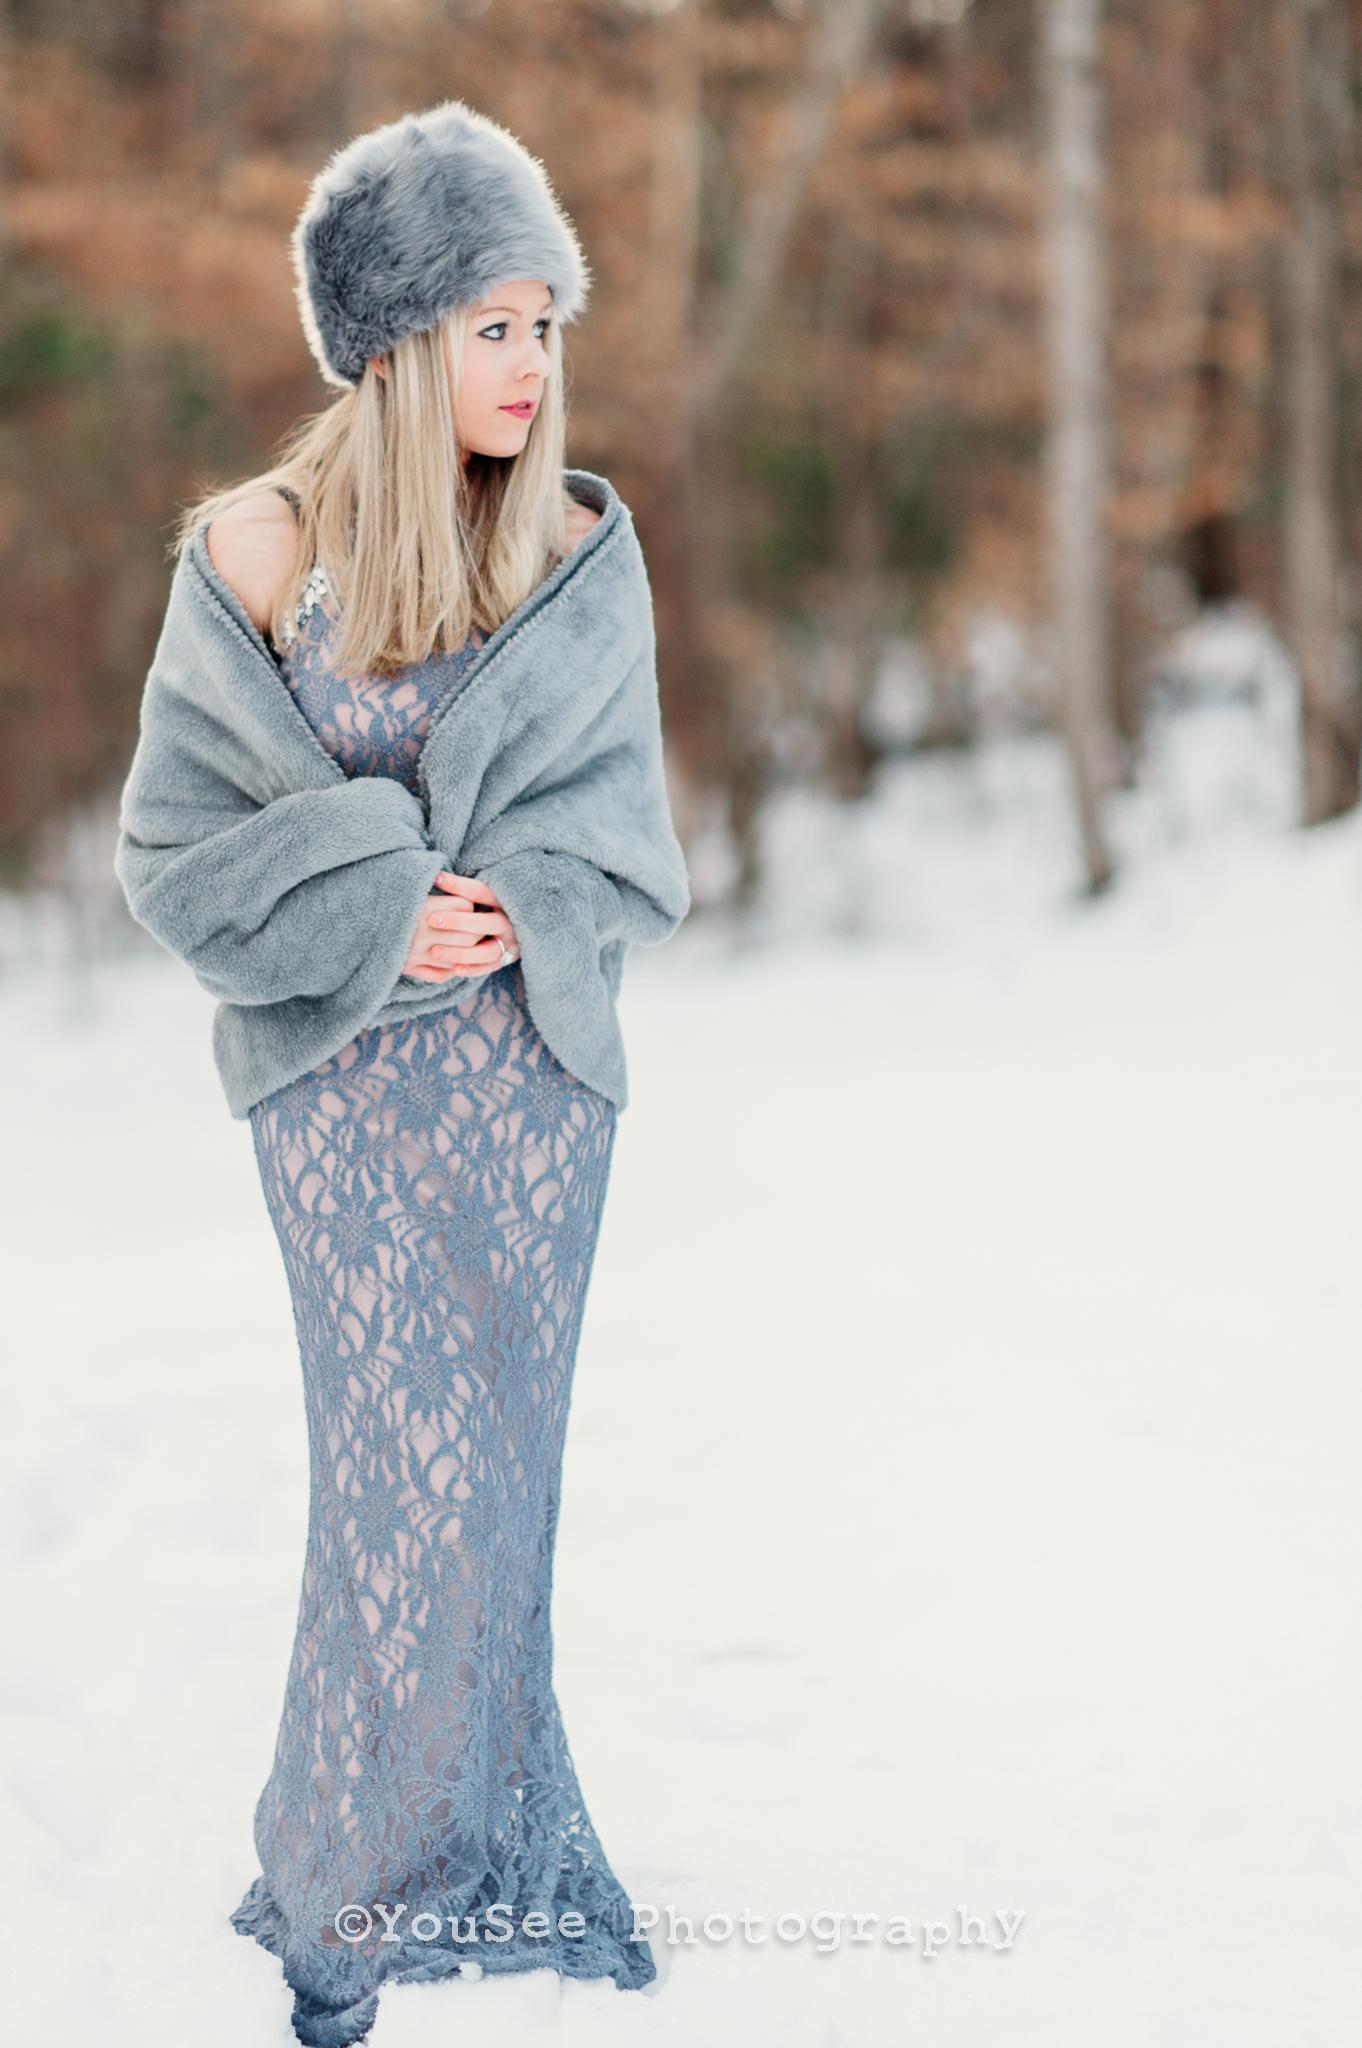 seniorportrait_fredericksburg_photography_winter2 (1)